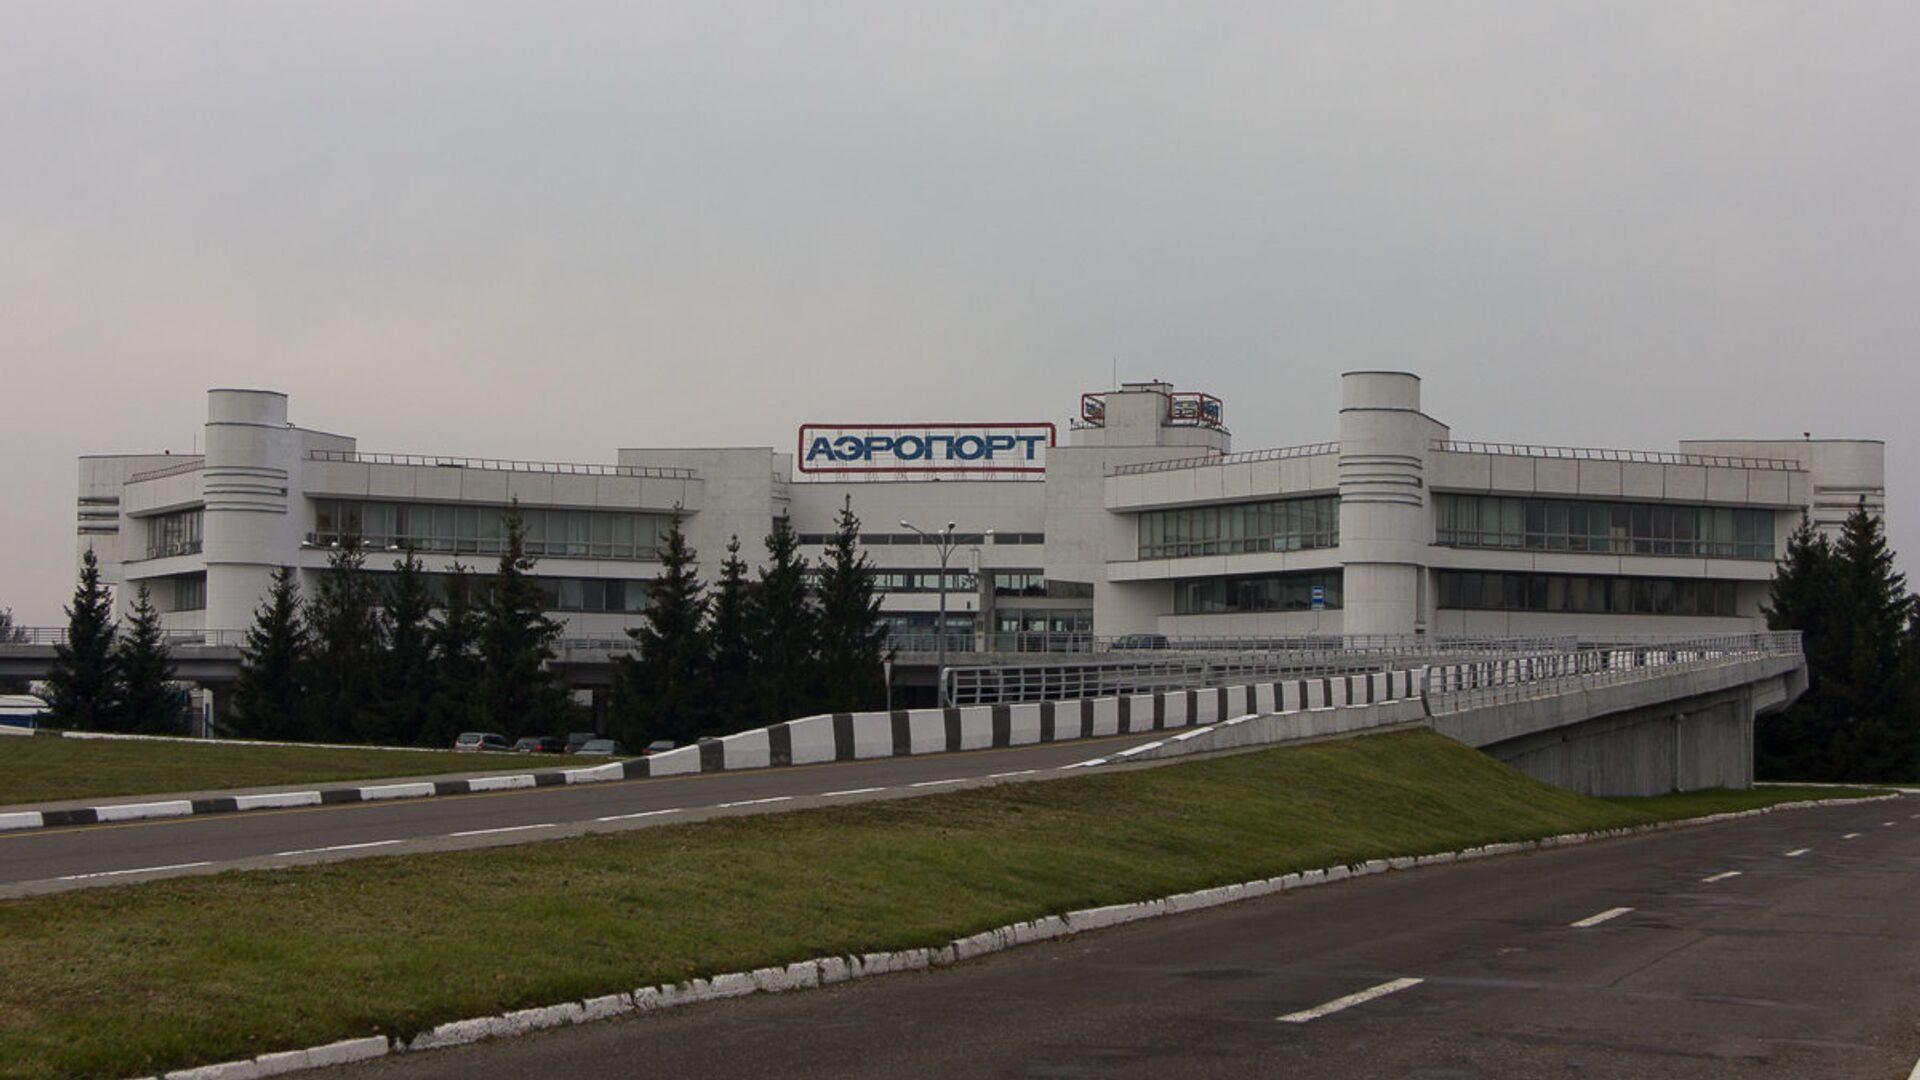 Аэропорт Брест - Sputnik Беларусь, 1920, 15.09.2021